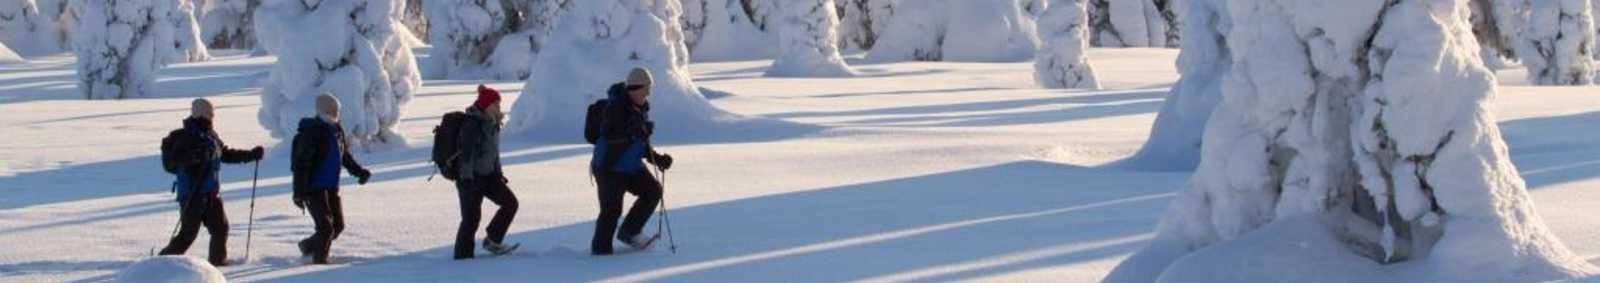 snowshoeing in Finland